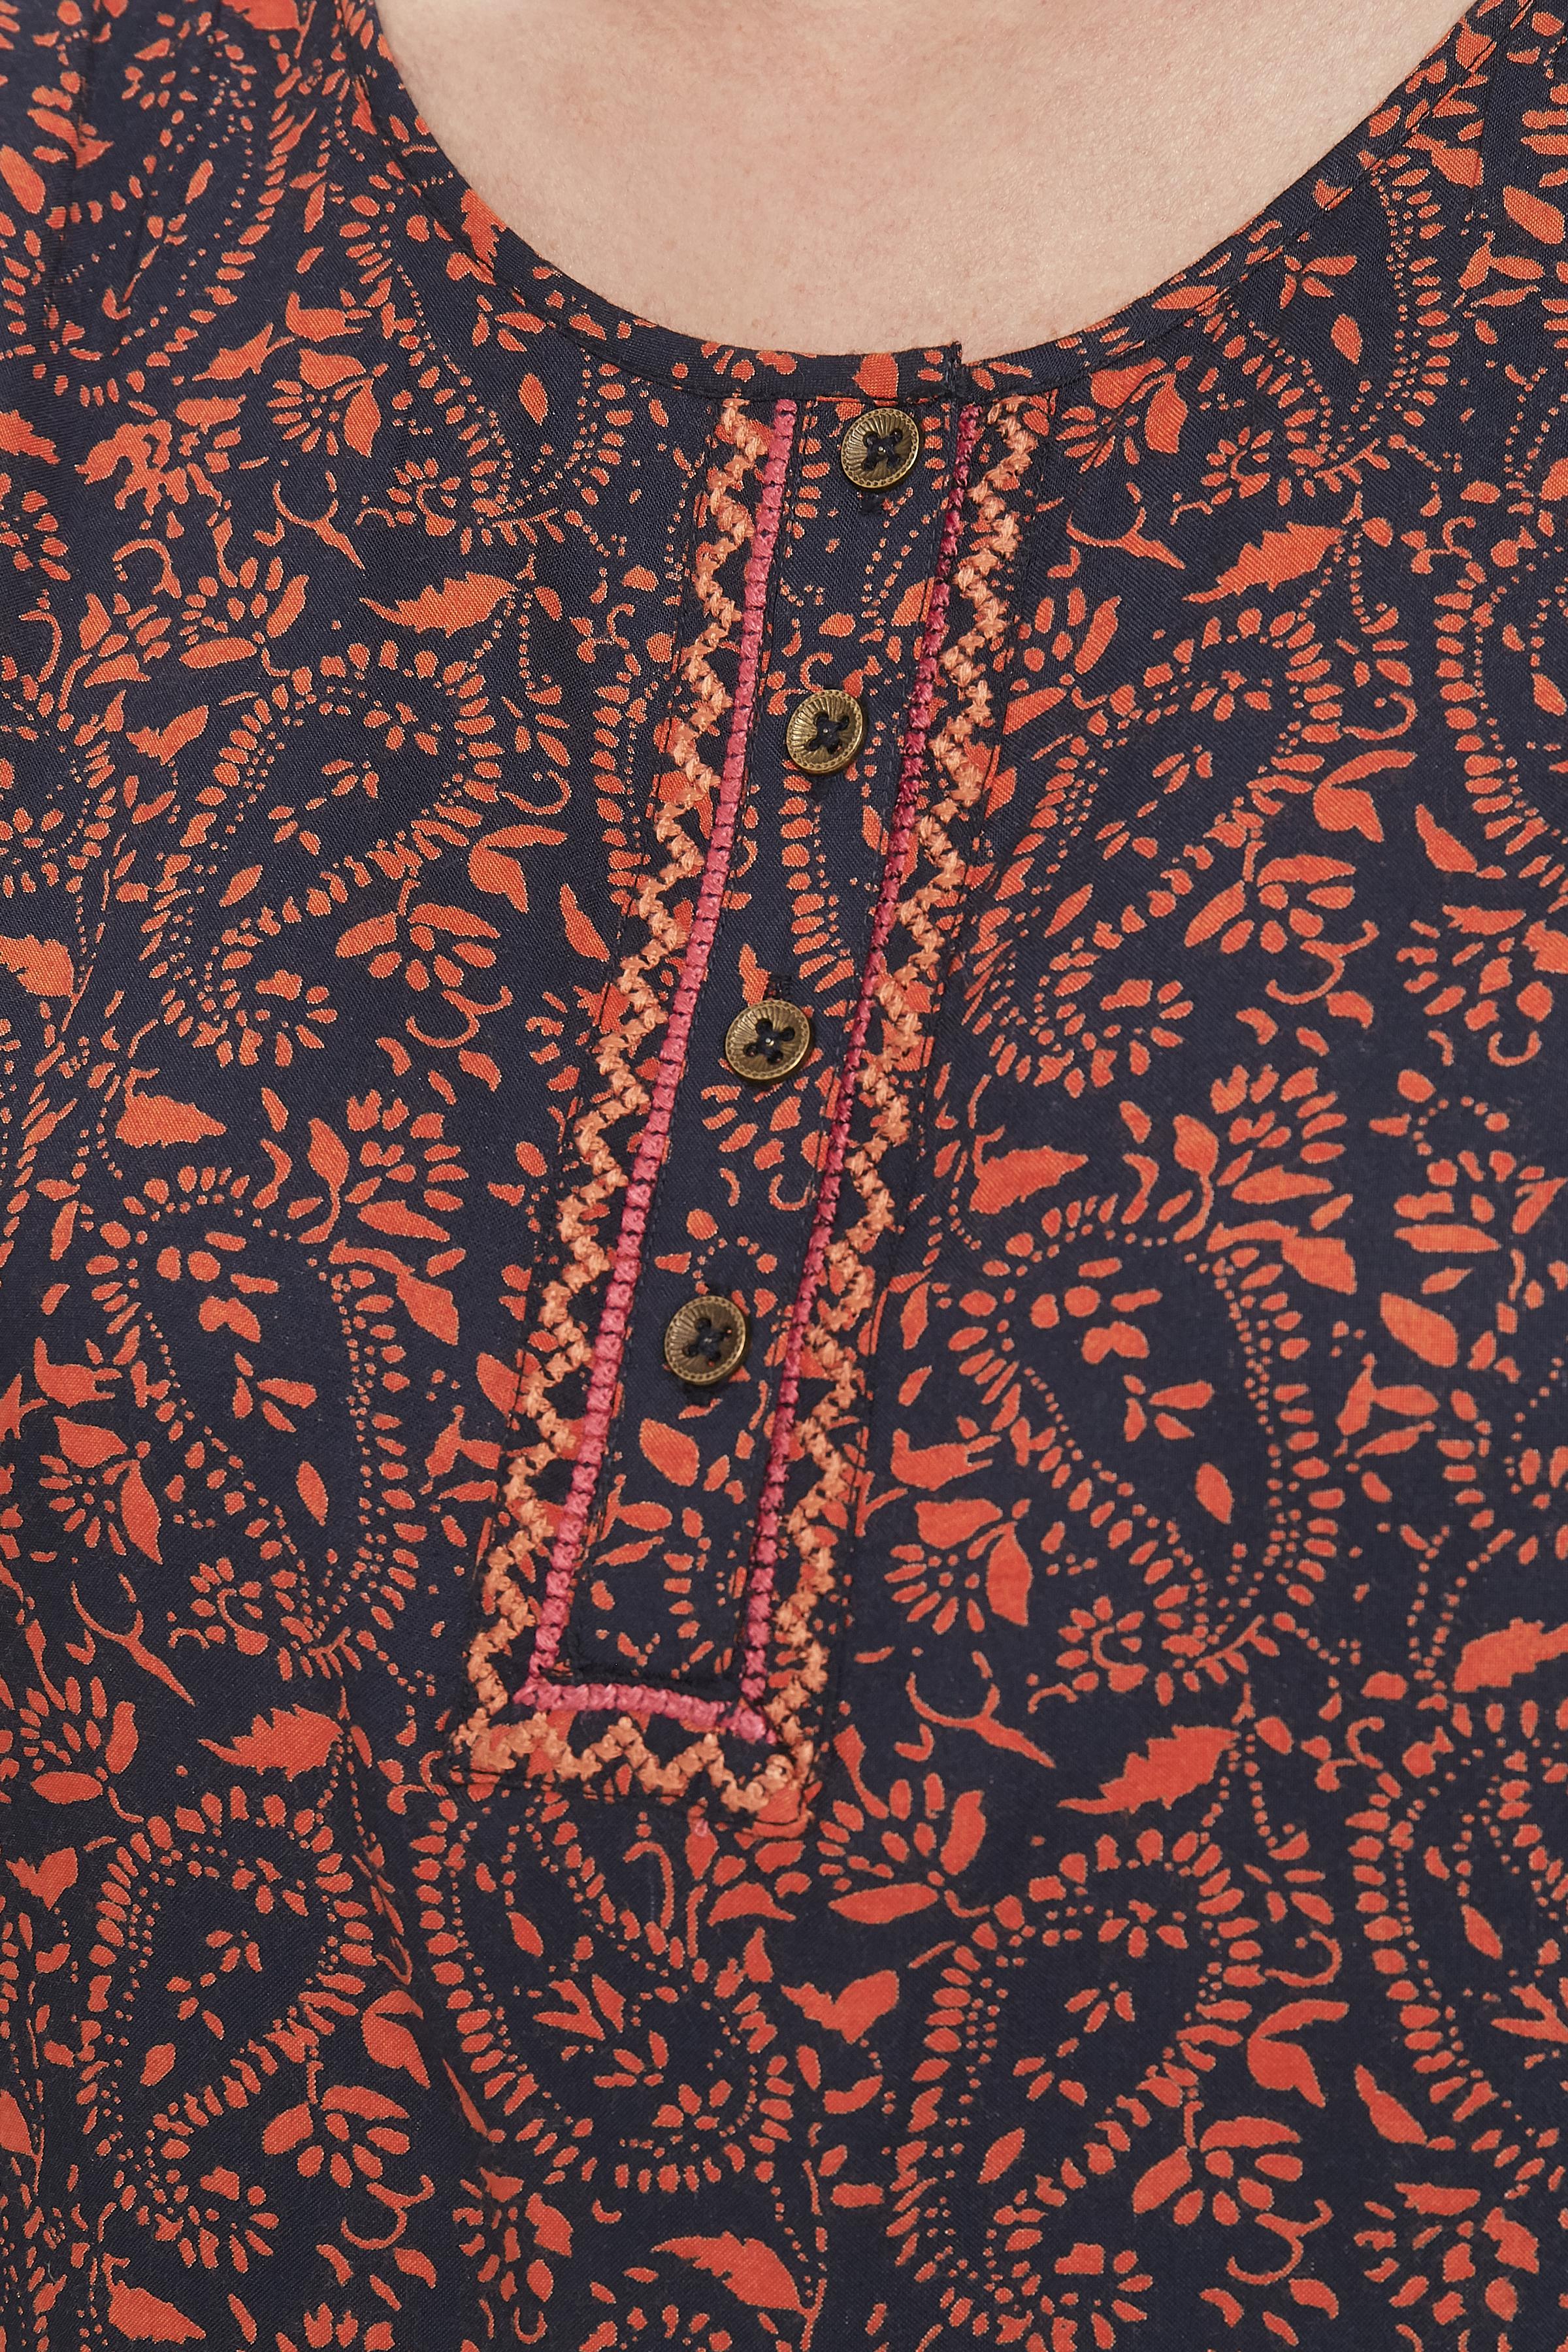 Marineblau/orange Top von Bon'A Parte – Shoppen Sie Marineblau/orange Top ab Gr. S-2XL hier